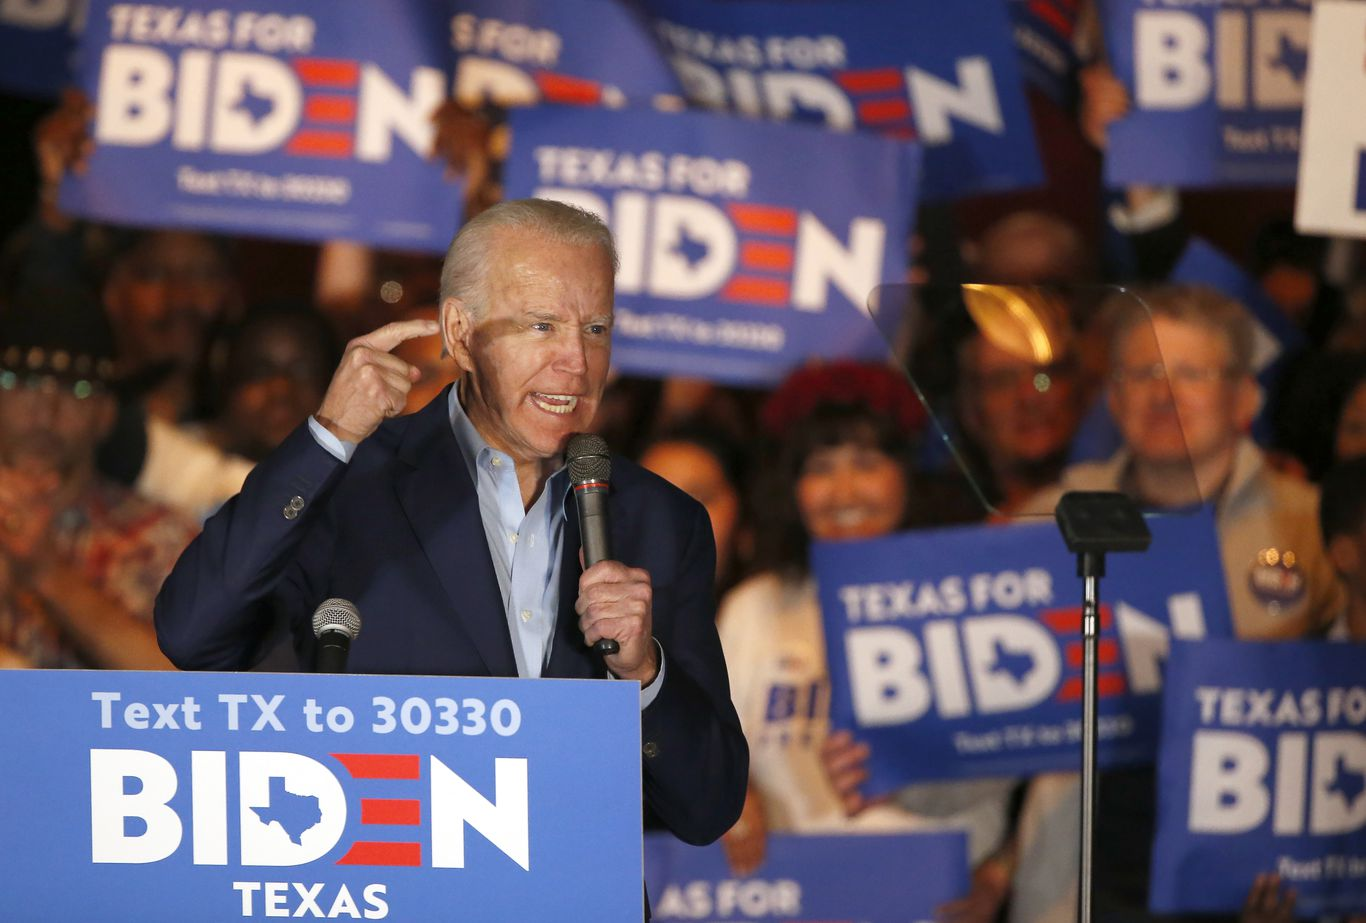 Texas Democrats beg Biden to spend now